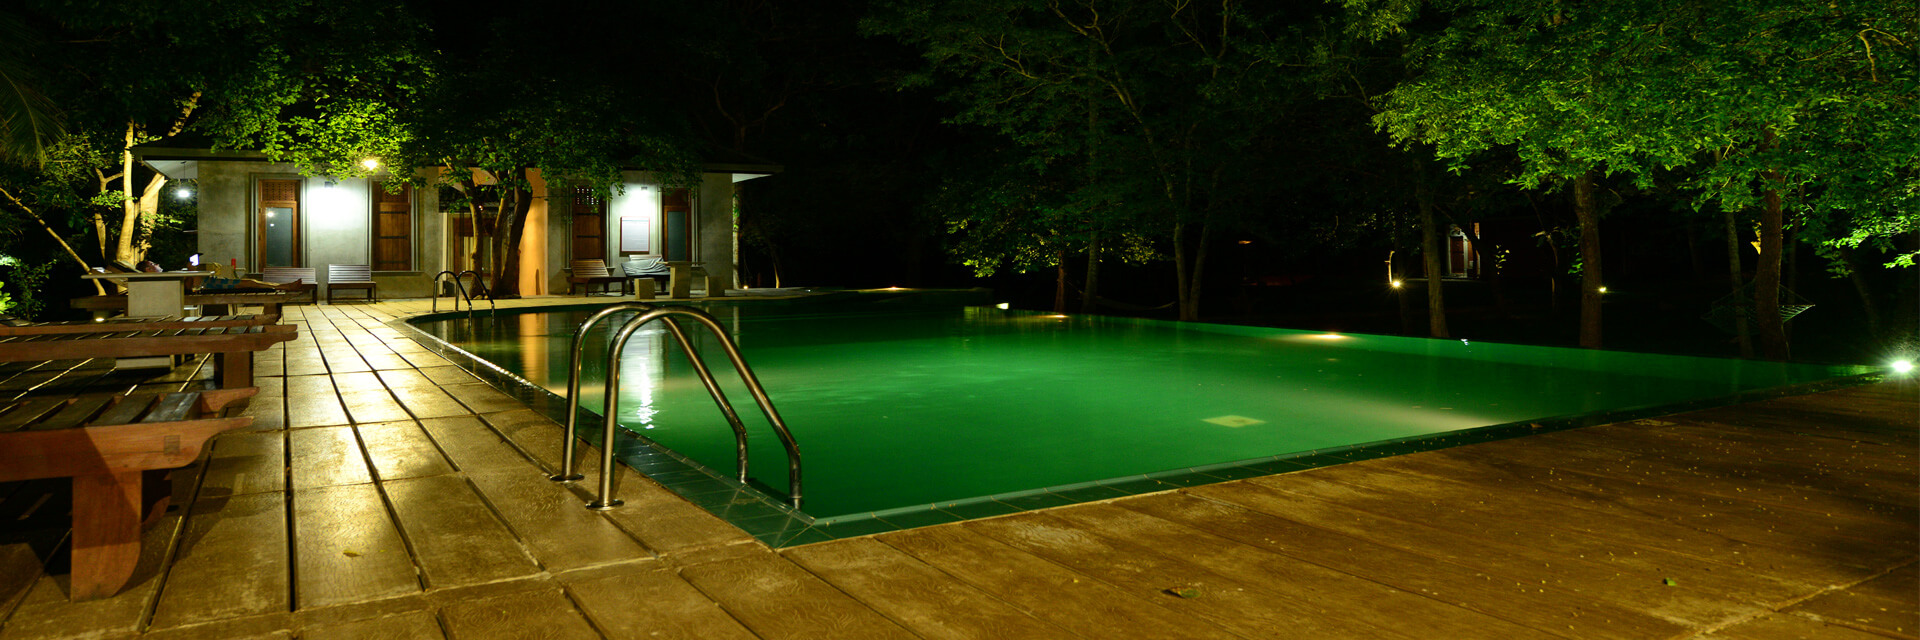 udawalawe hotels sri lanka - Passage Nili Diya Mankada Hotel Udawalawe